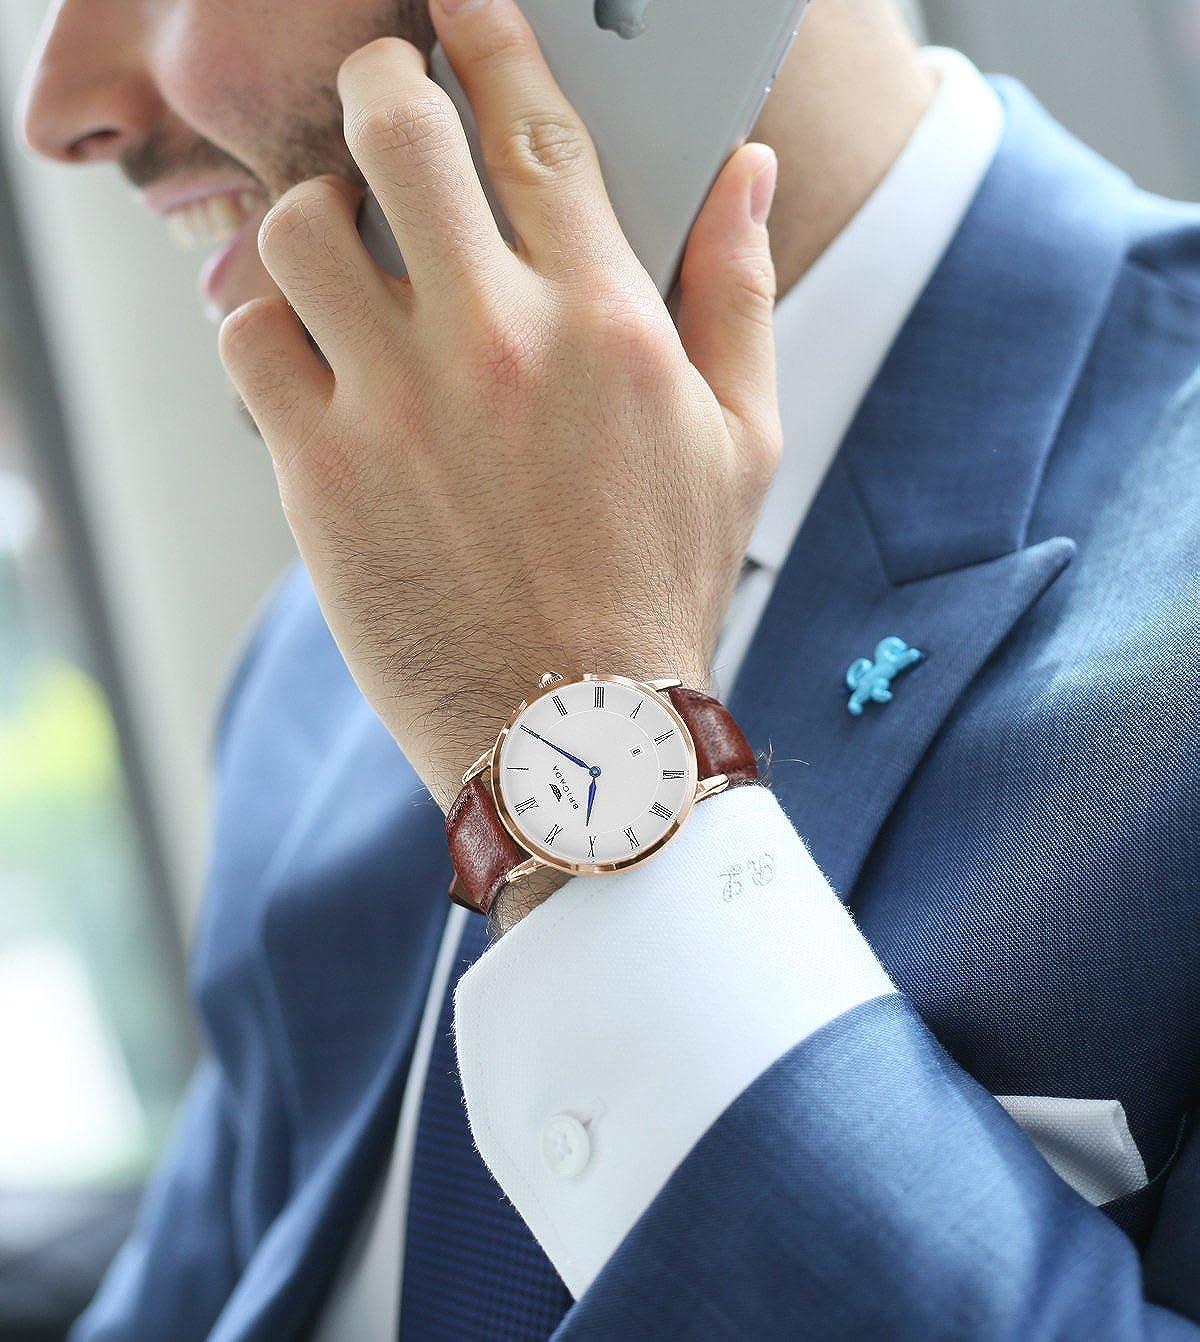 Swiss Brand Nice Fashion Minimalist Men s Dress Watch Waterproof, Rose Gold Case Business Casual Men s Wrist Watch